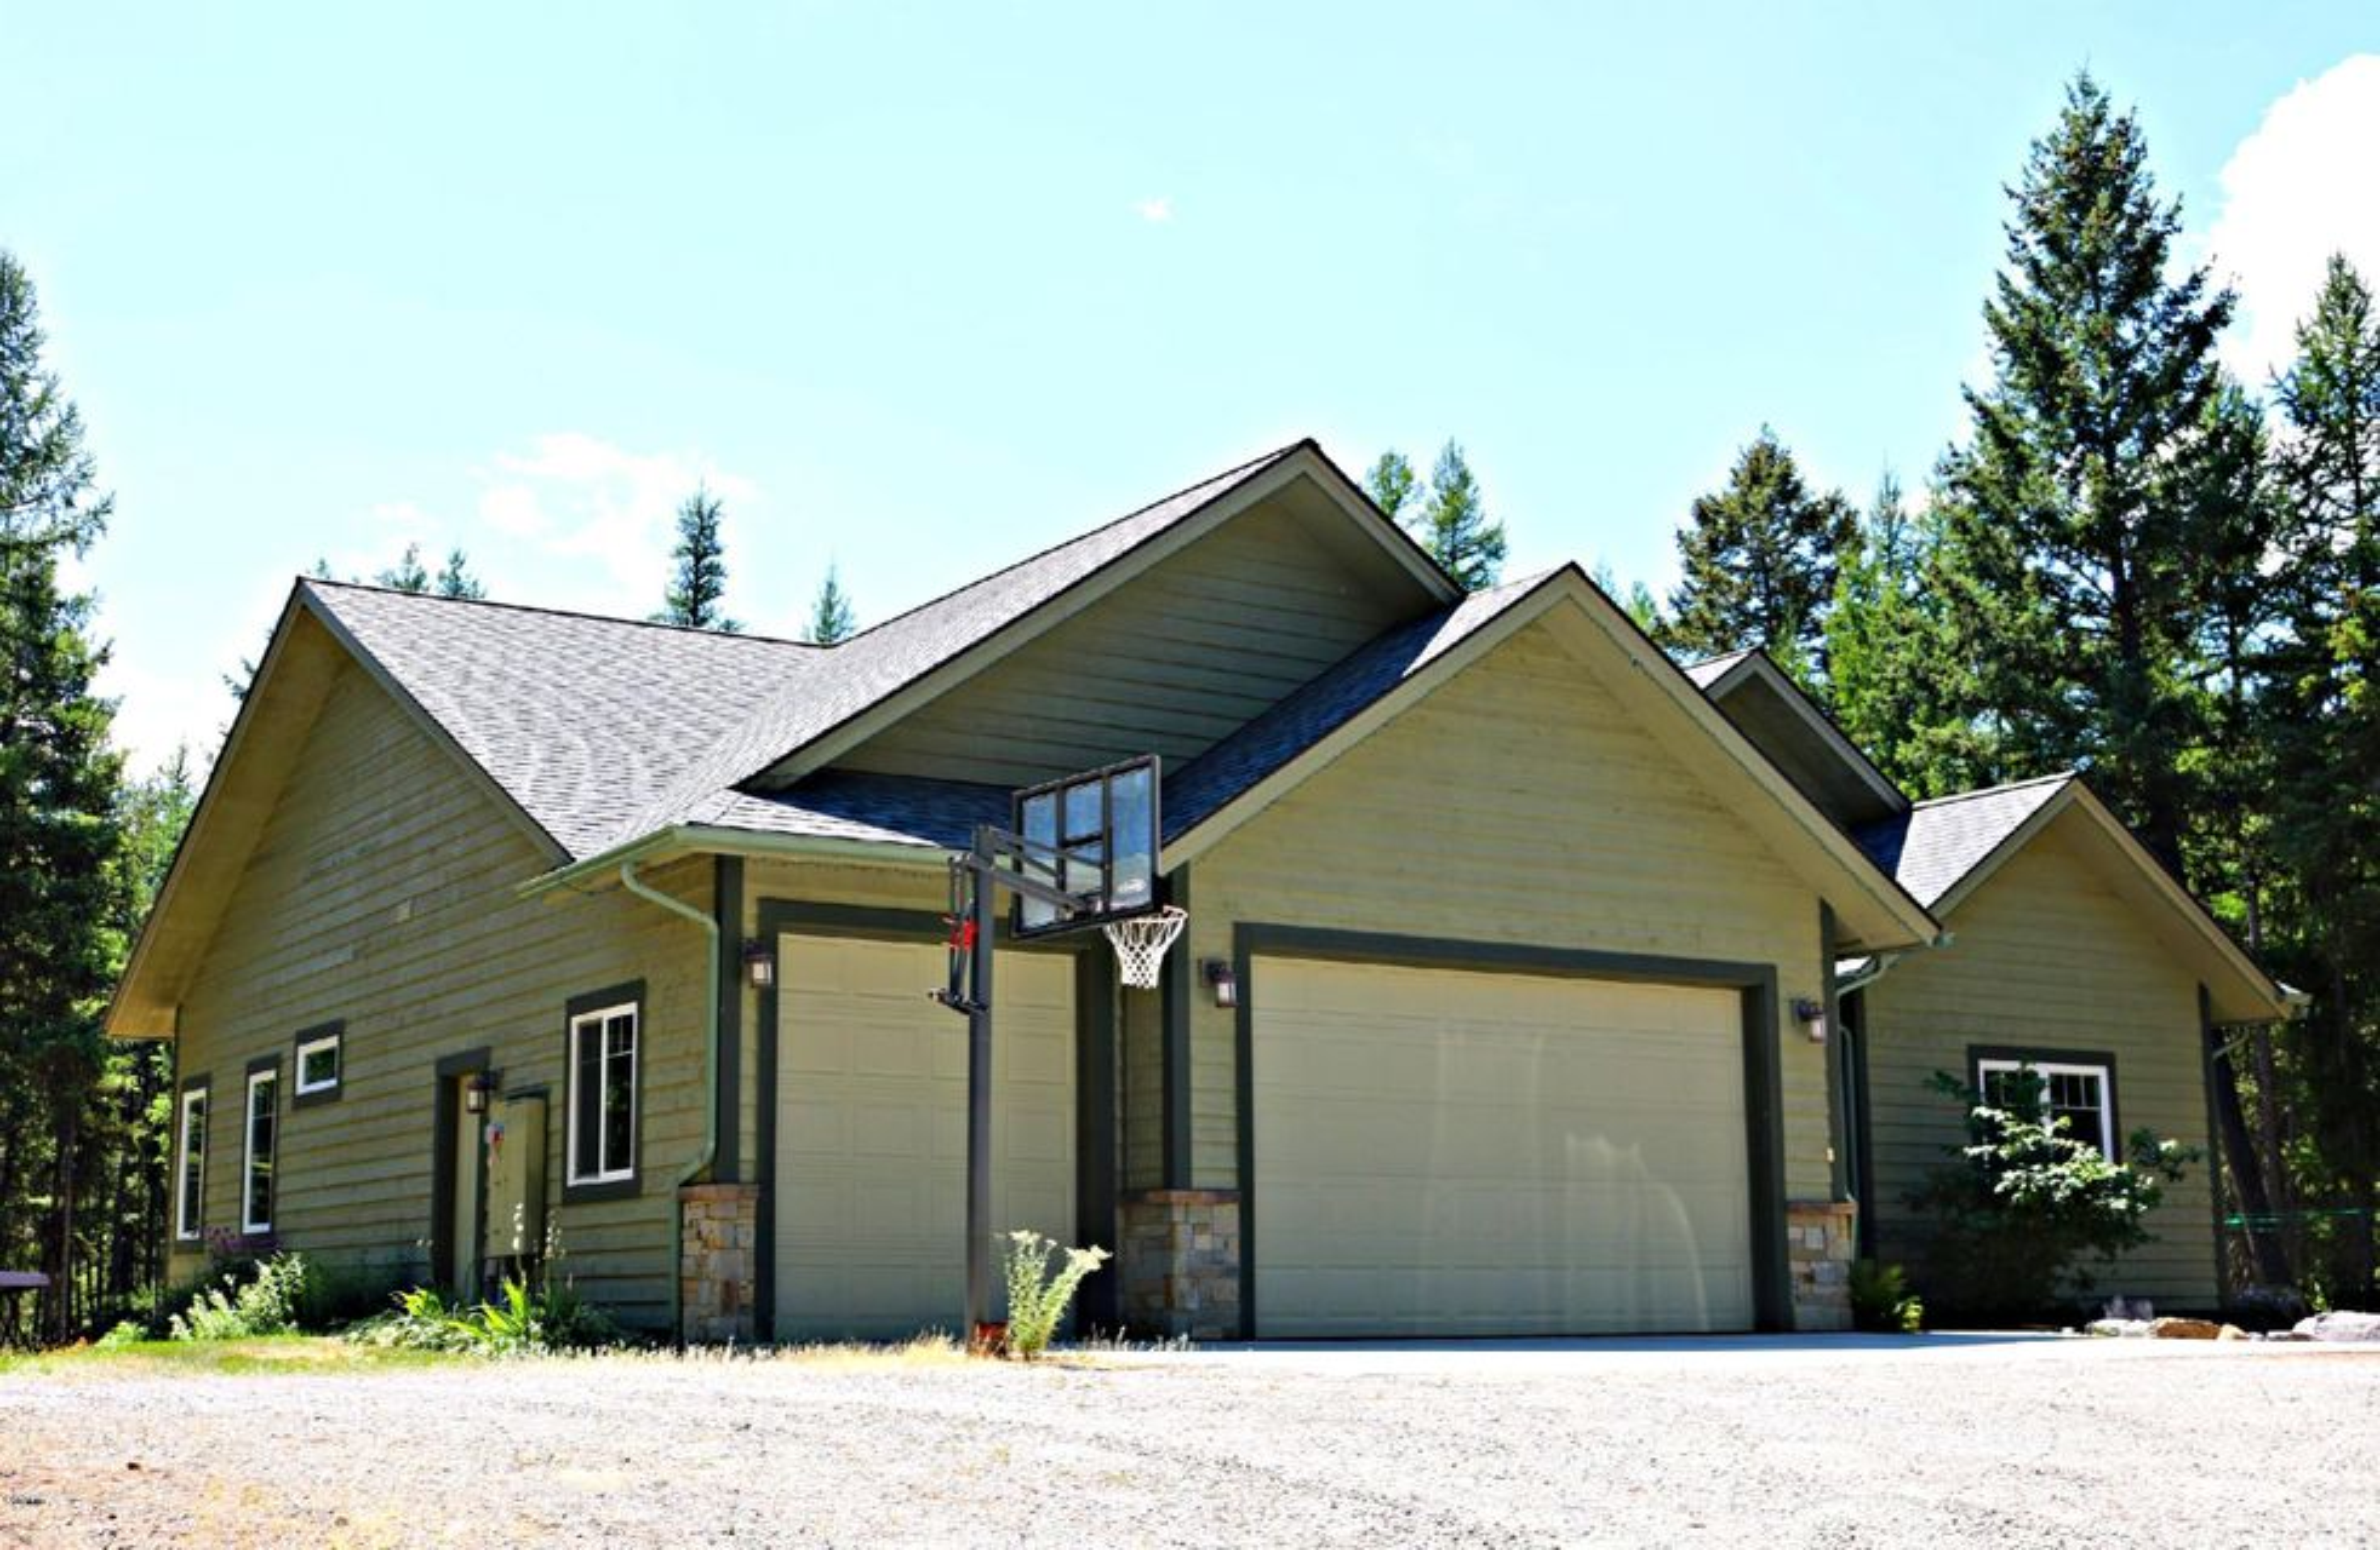 Single Family Home for Sale at 88 Brady Way 88 Brady Way Whitefish, Montana 59937 United States